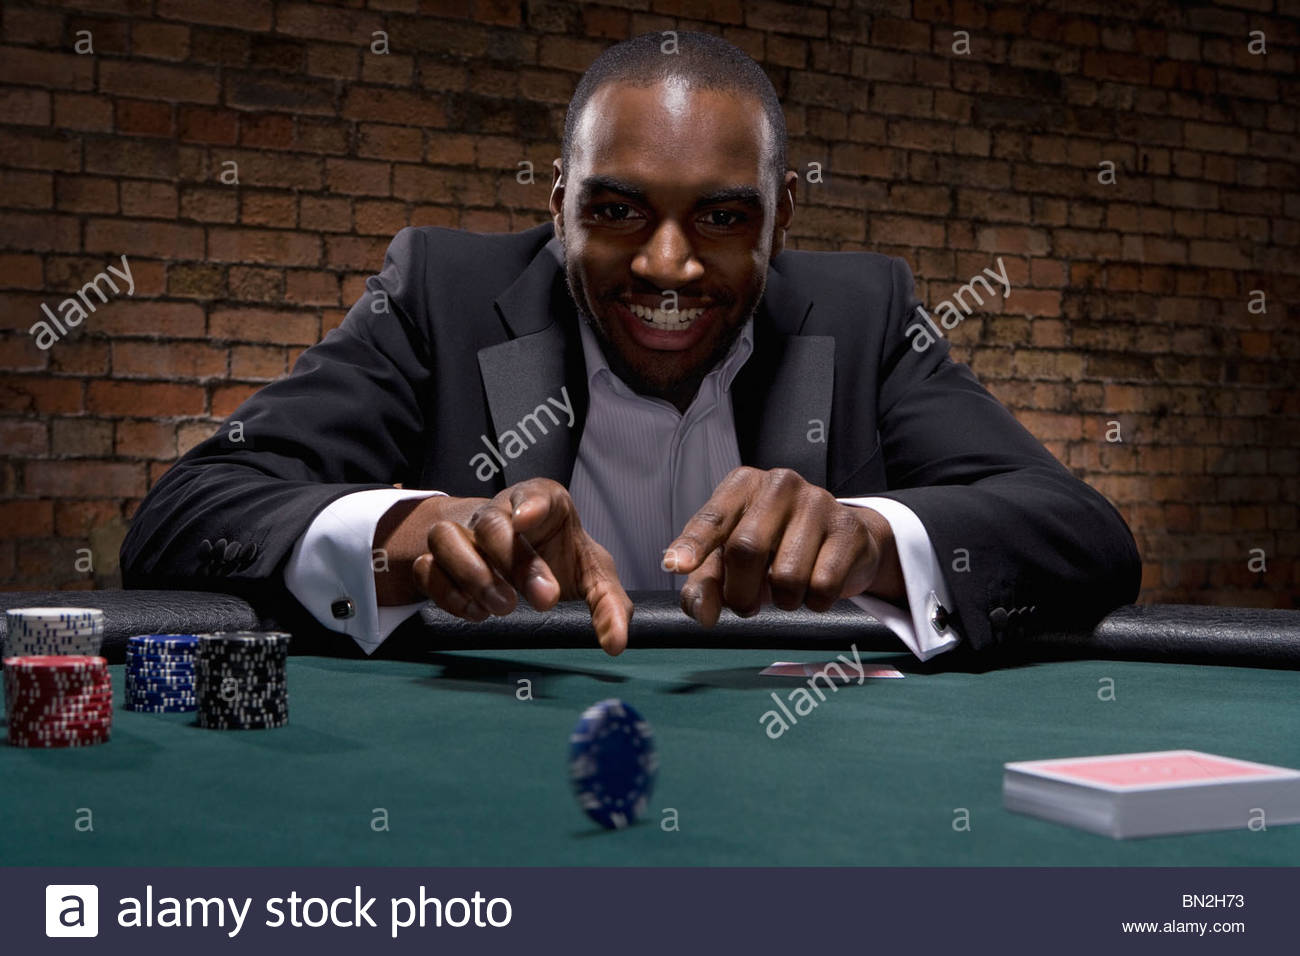 Man rolling poker chip in casino - Stock Image